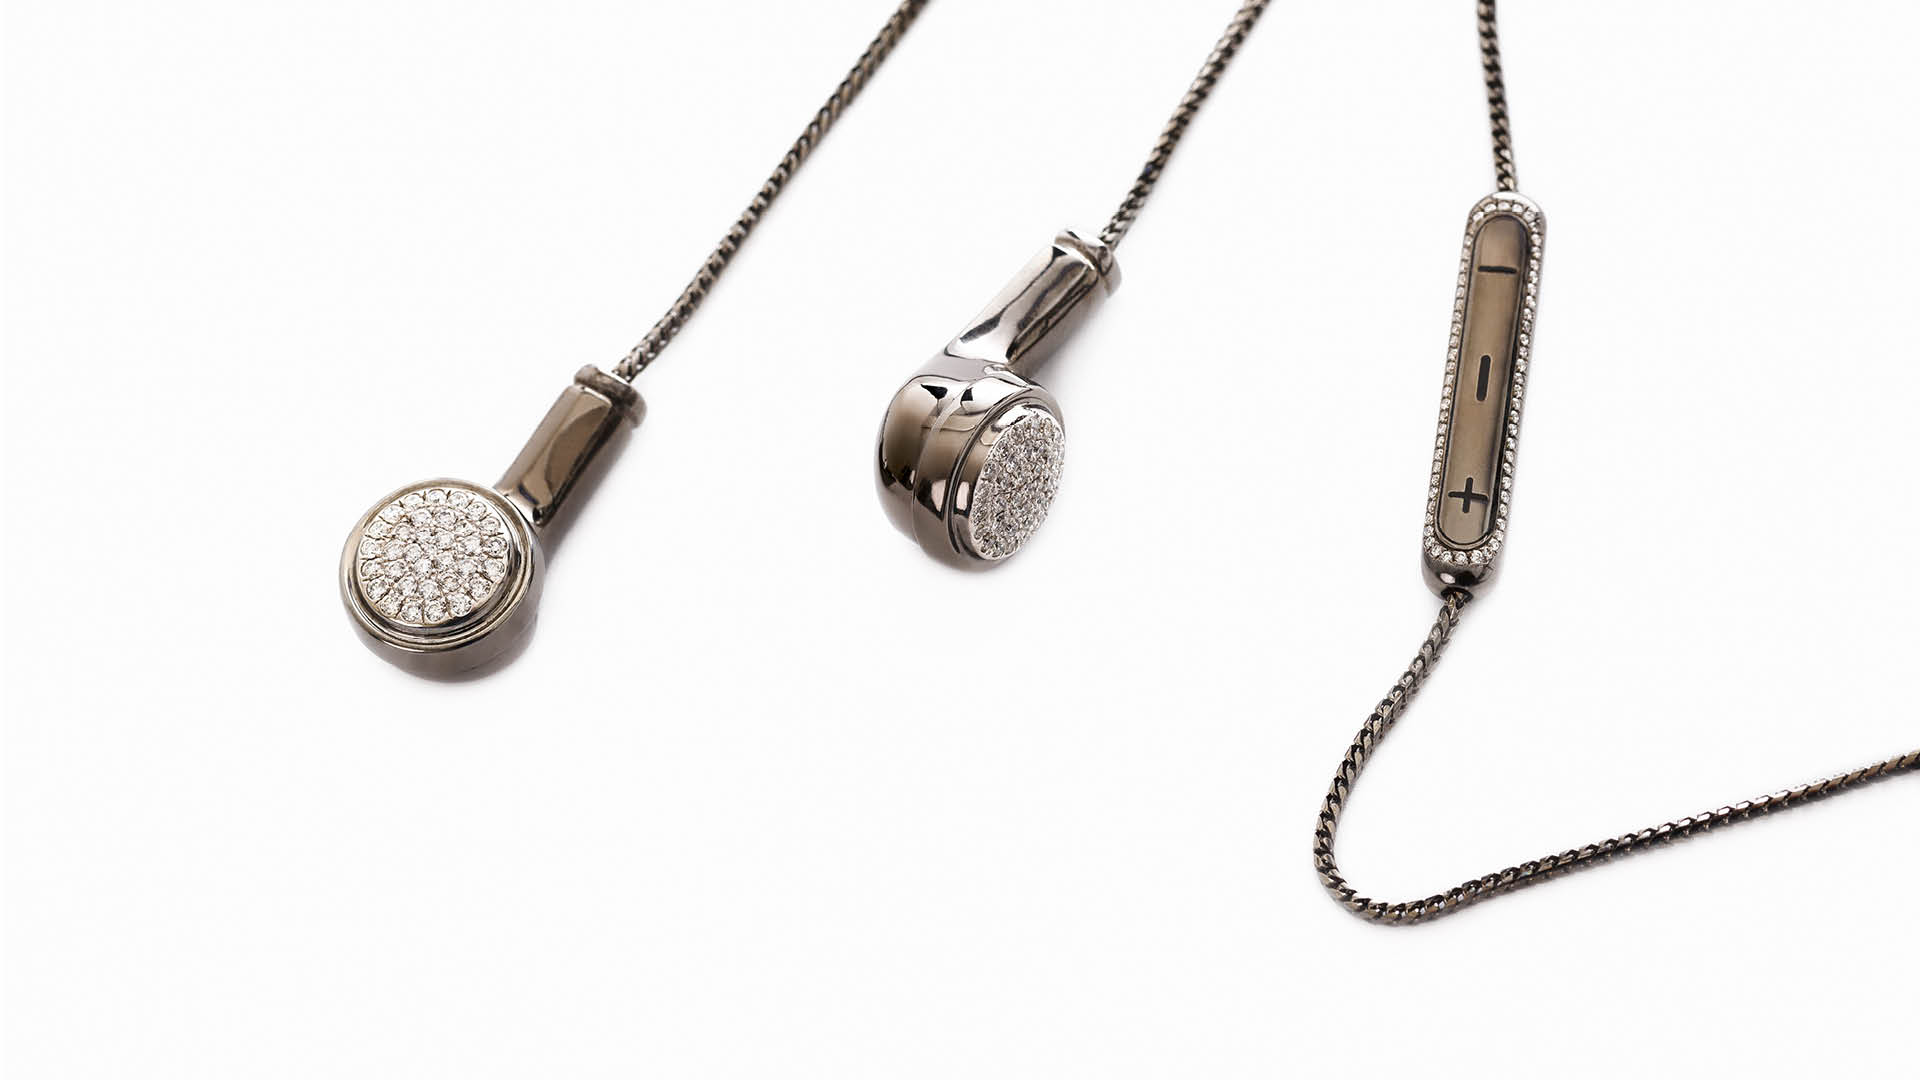 Nadine-Ghosn-Ear-Phones-Jewellery